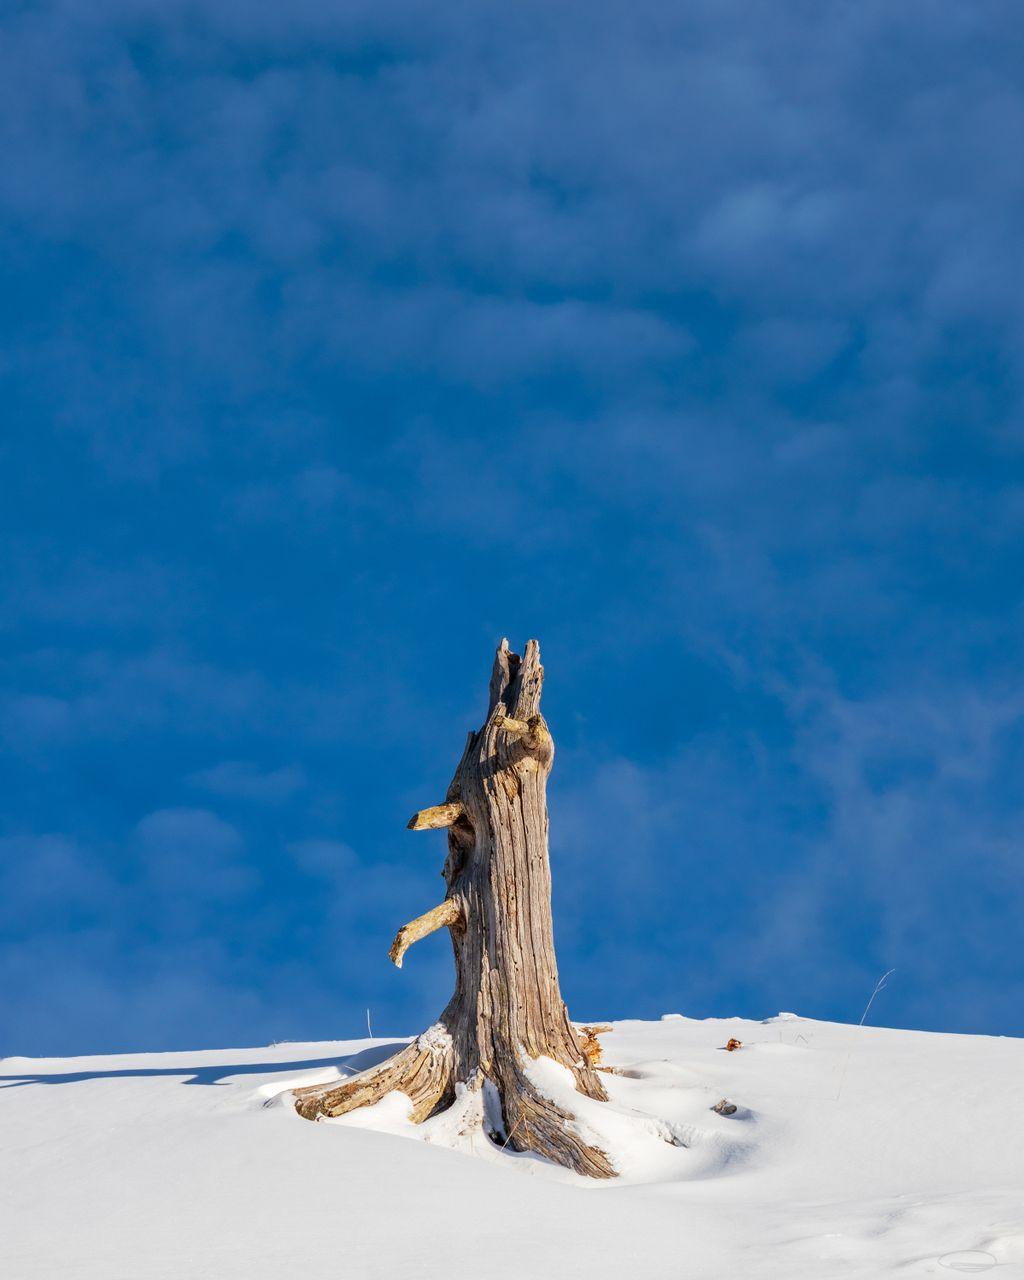 Tree Stump in the Snow on the Dobratsch Mountain